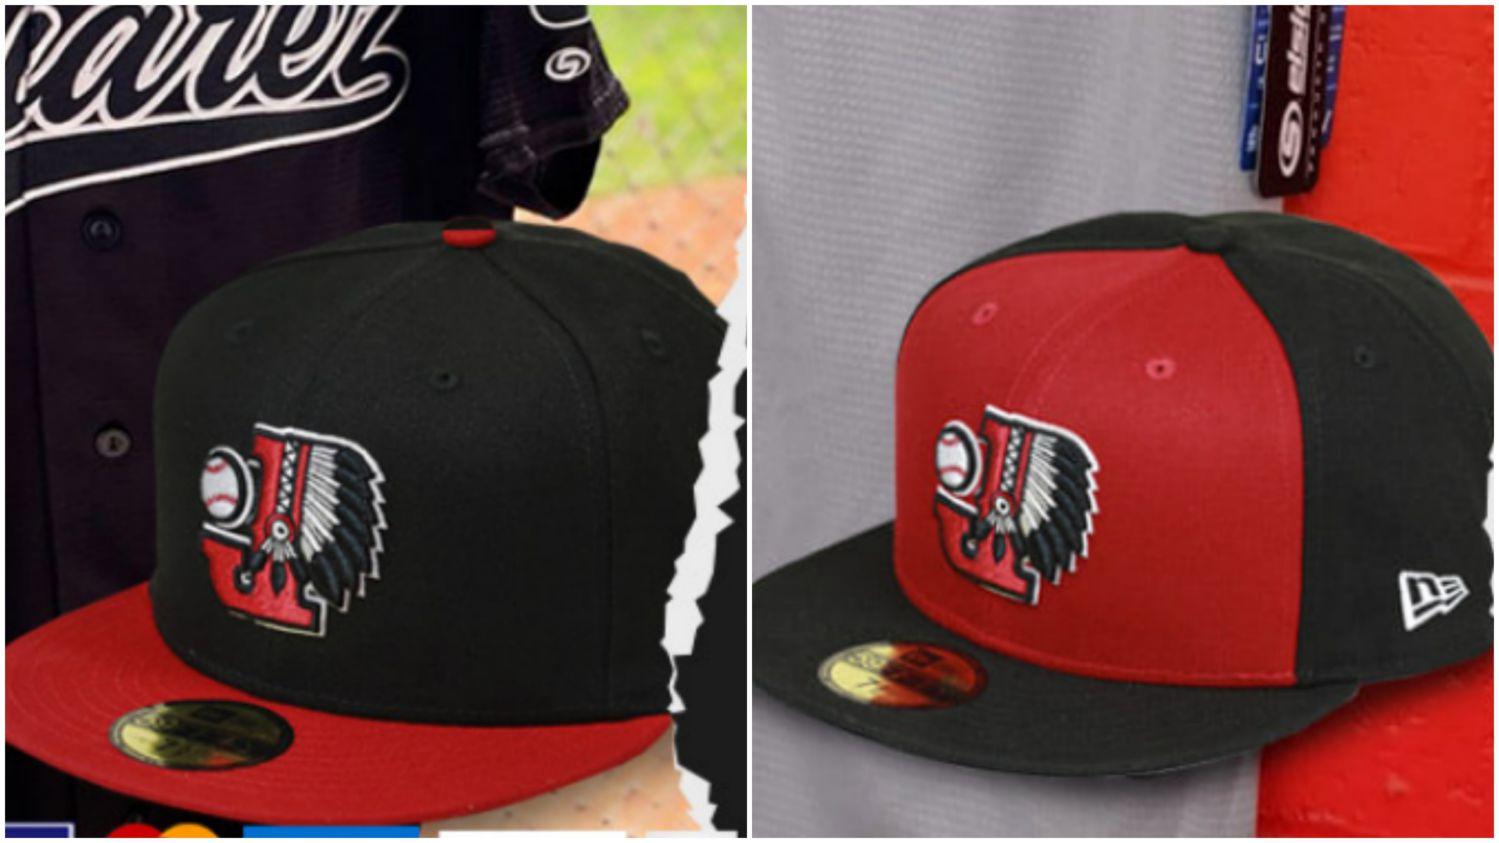 gorras-cachuchas-indios-juarez-2021-beisbol-chihuahua